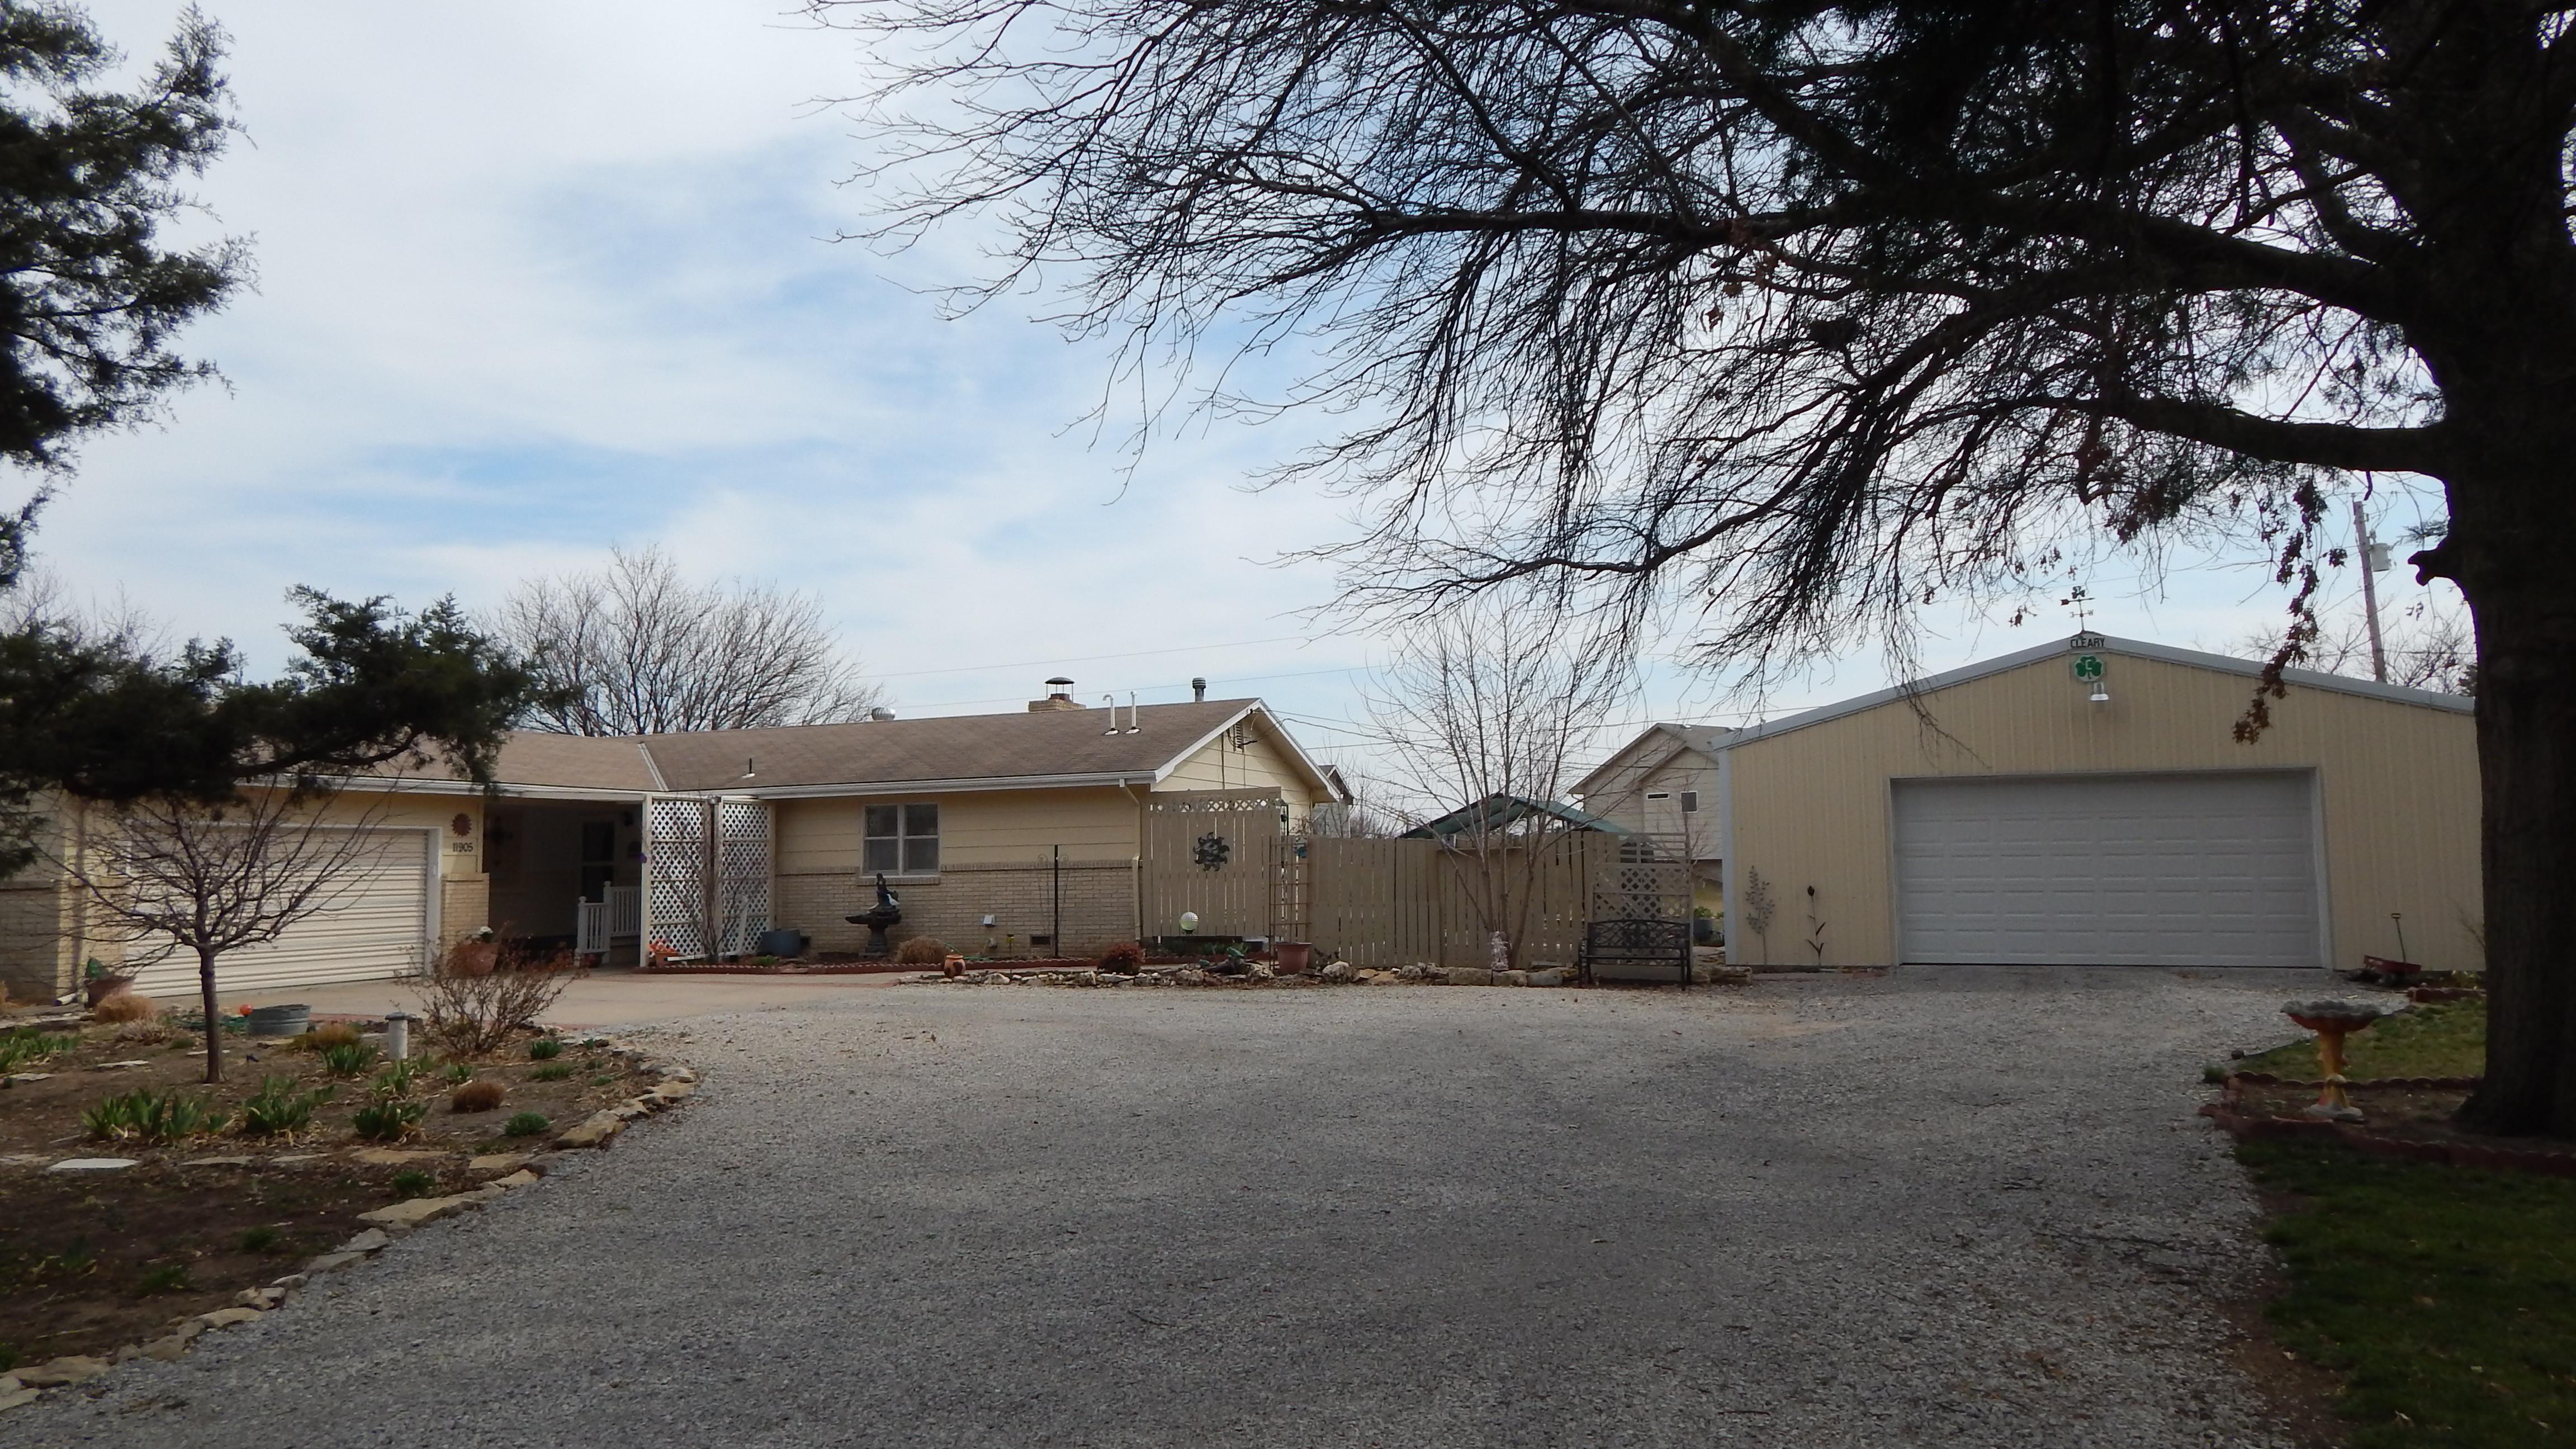 Maize Ks Homes For Sale Wichita Ks Homes For Sale